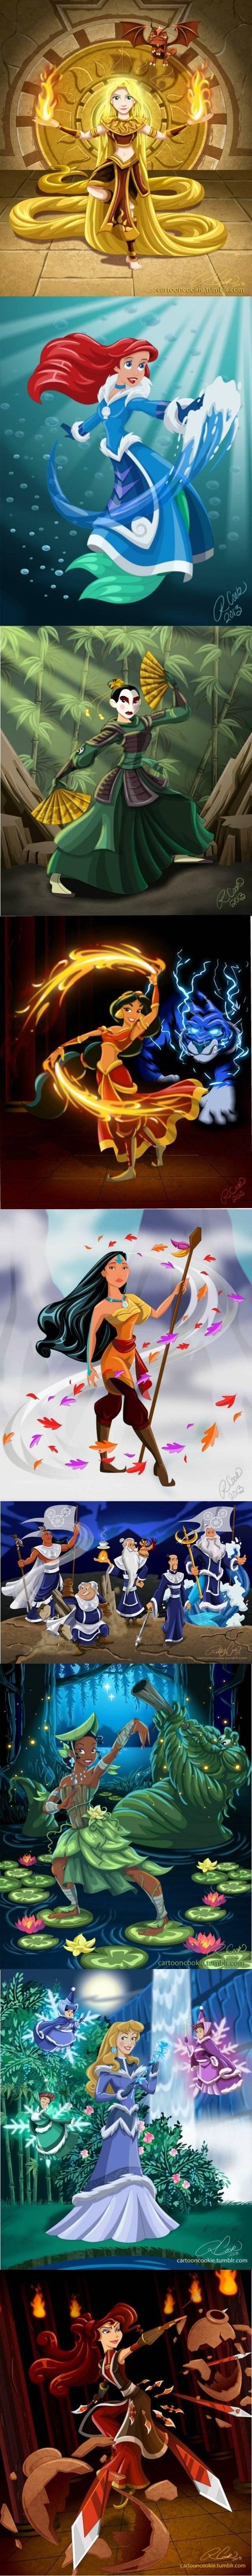 Disney as Avatar characters! Love it! :)